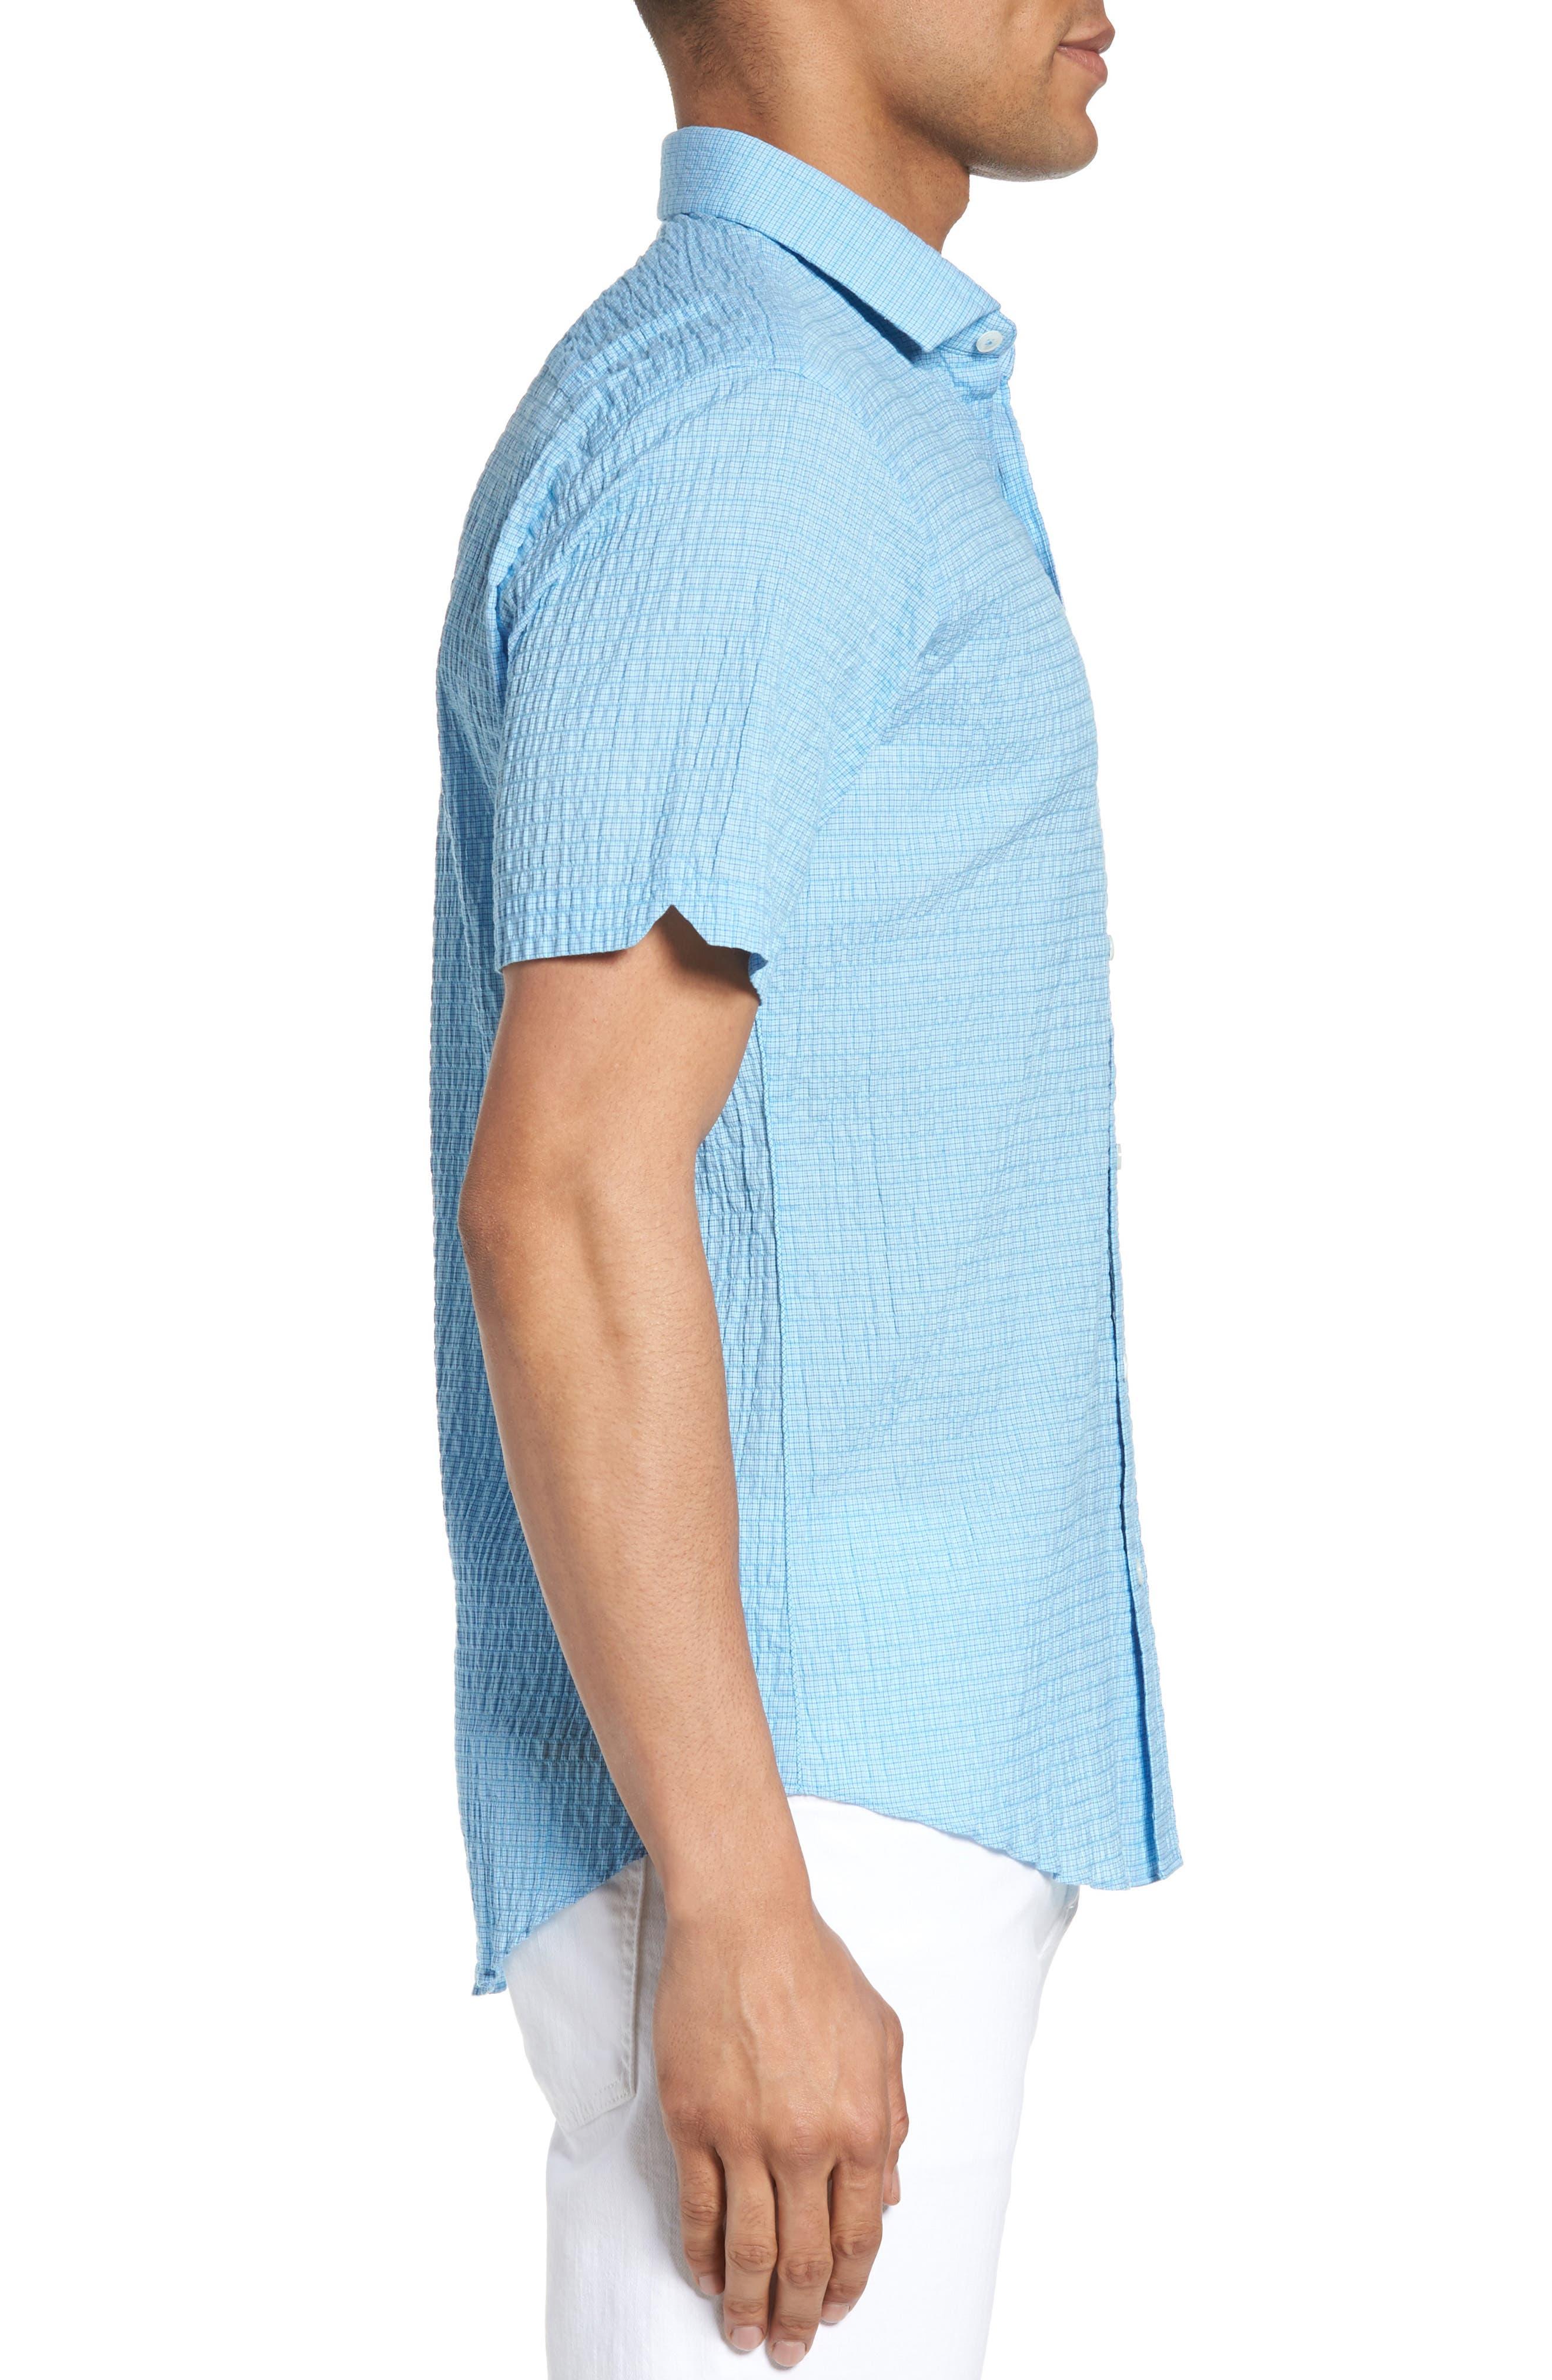 Morales Sport Shirt,                             Alternate thumbnail 3, color,                             Light Blue